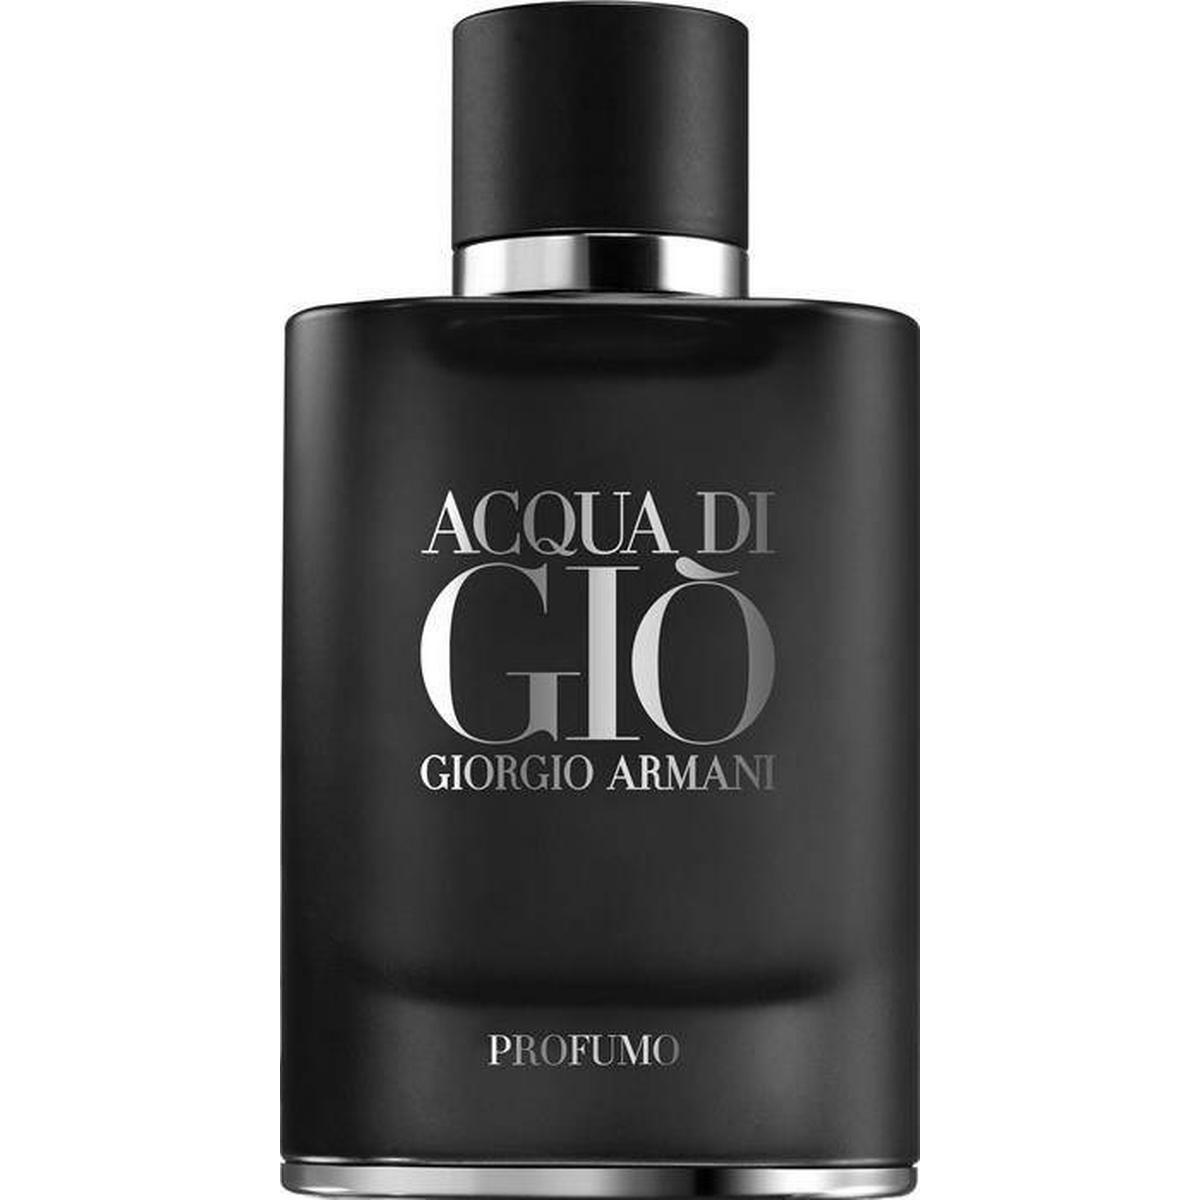 Armani Giorgio Prices Best On Pricerunner Fragrance The Market Compare 3RjLA54